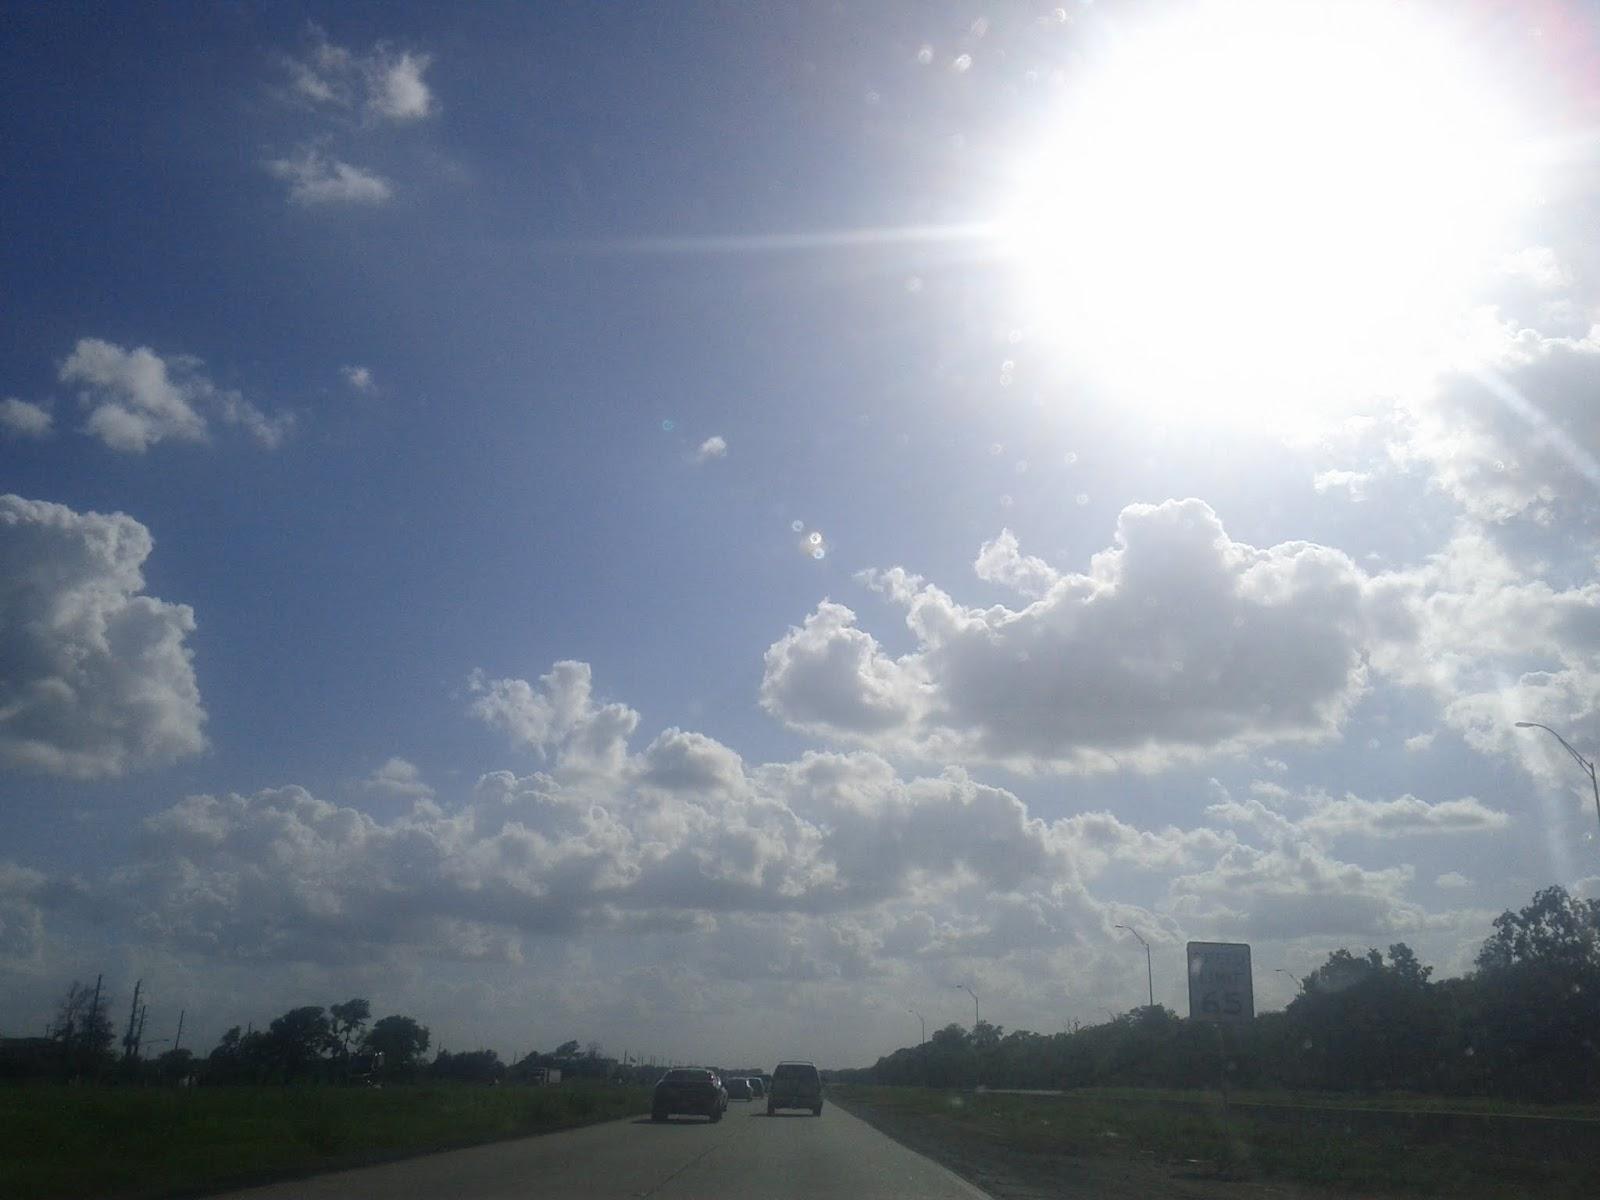 Sky - IMG_20120730_174900.jpg